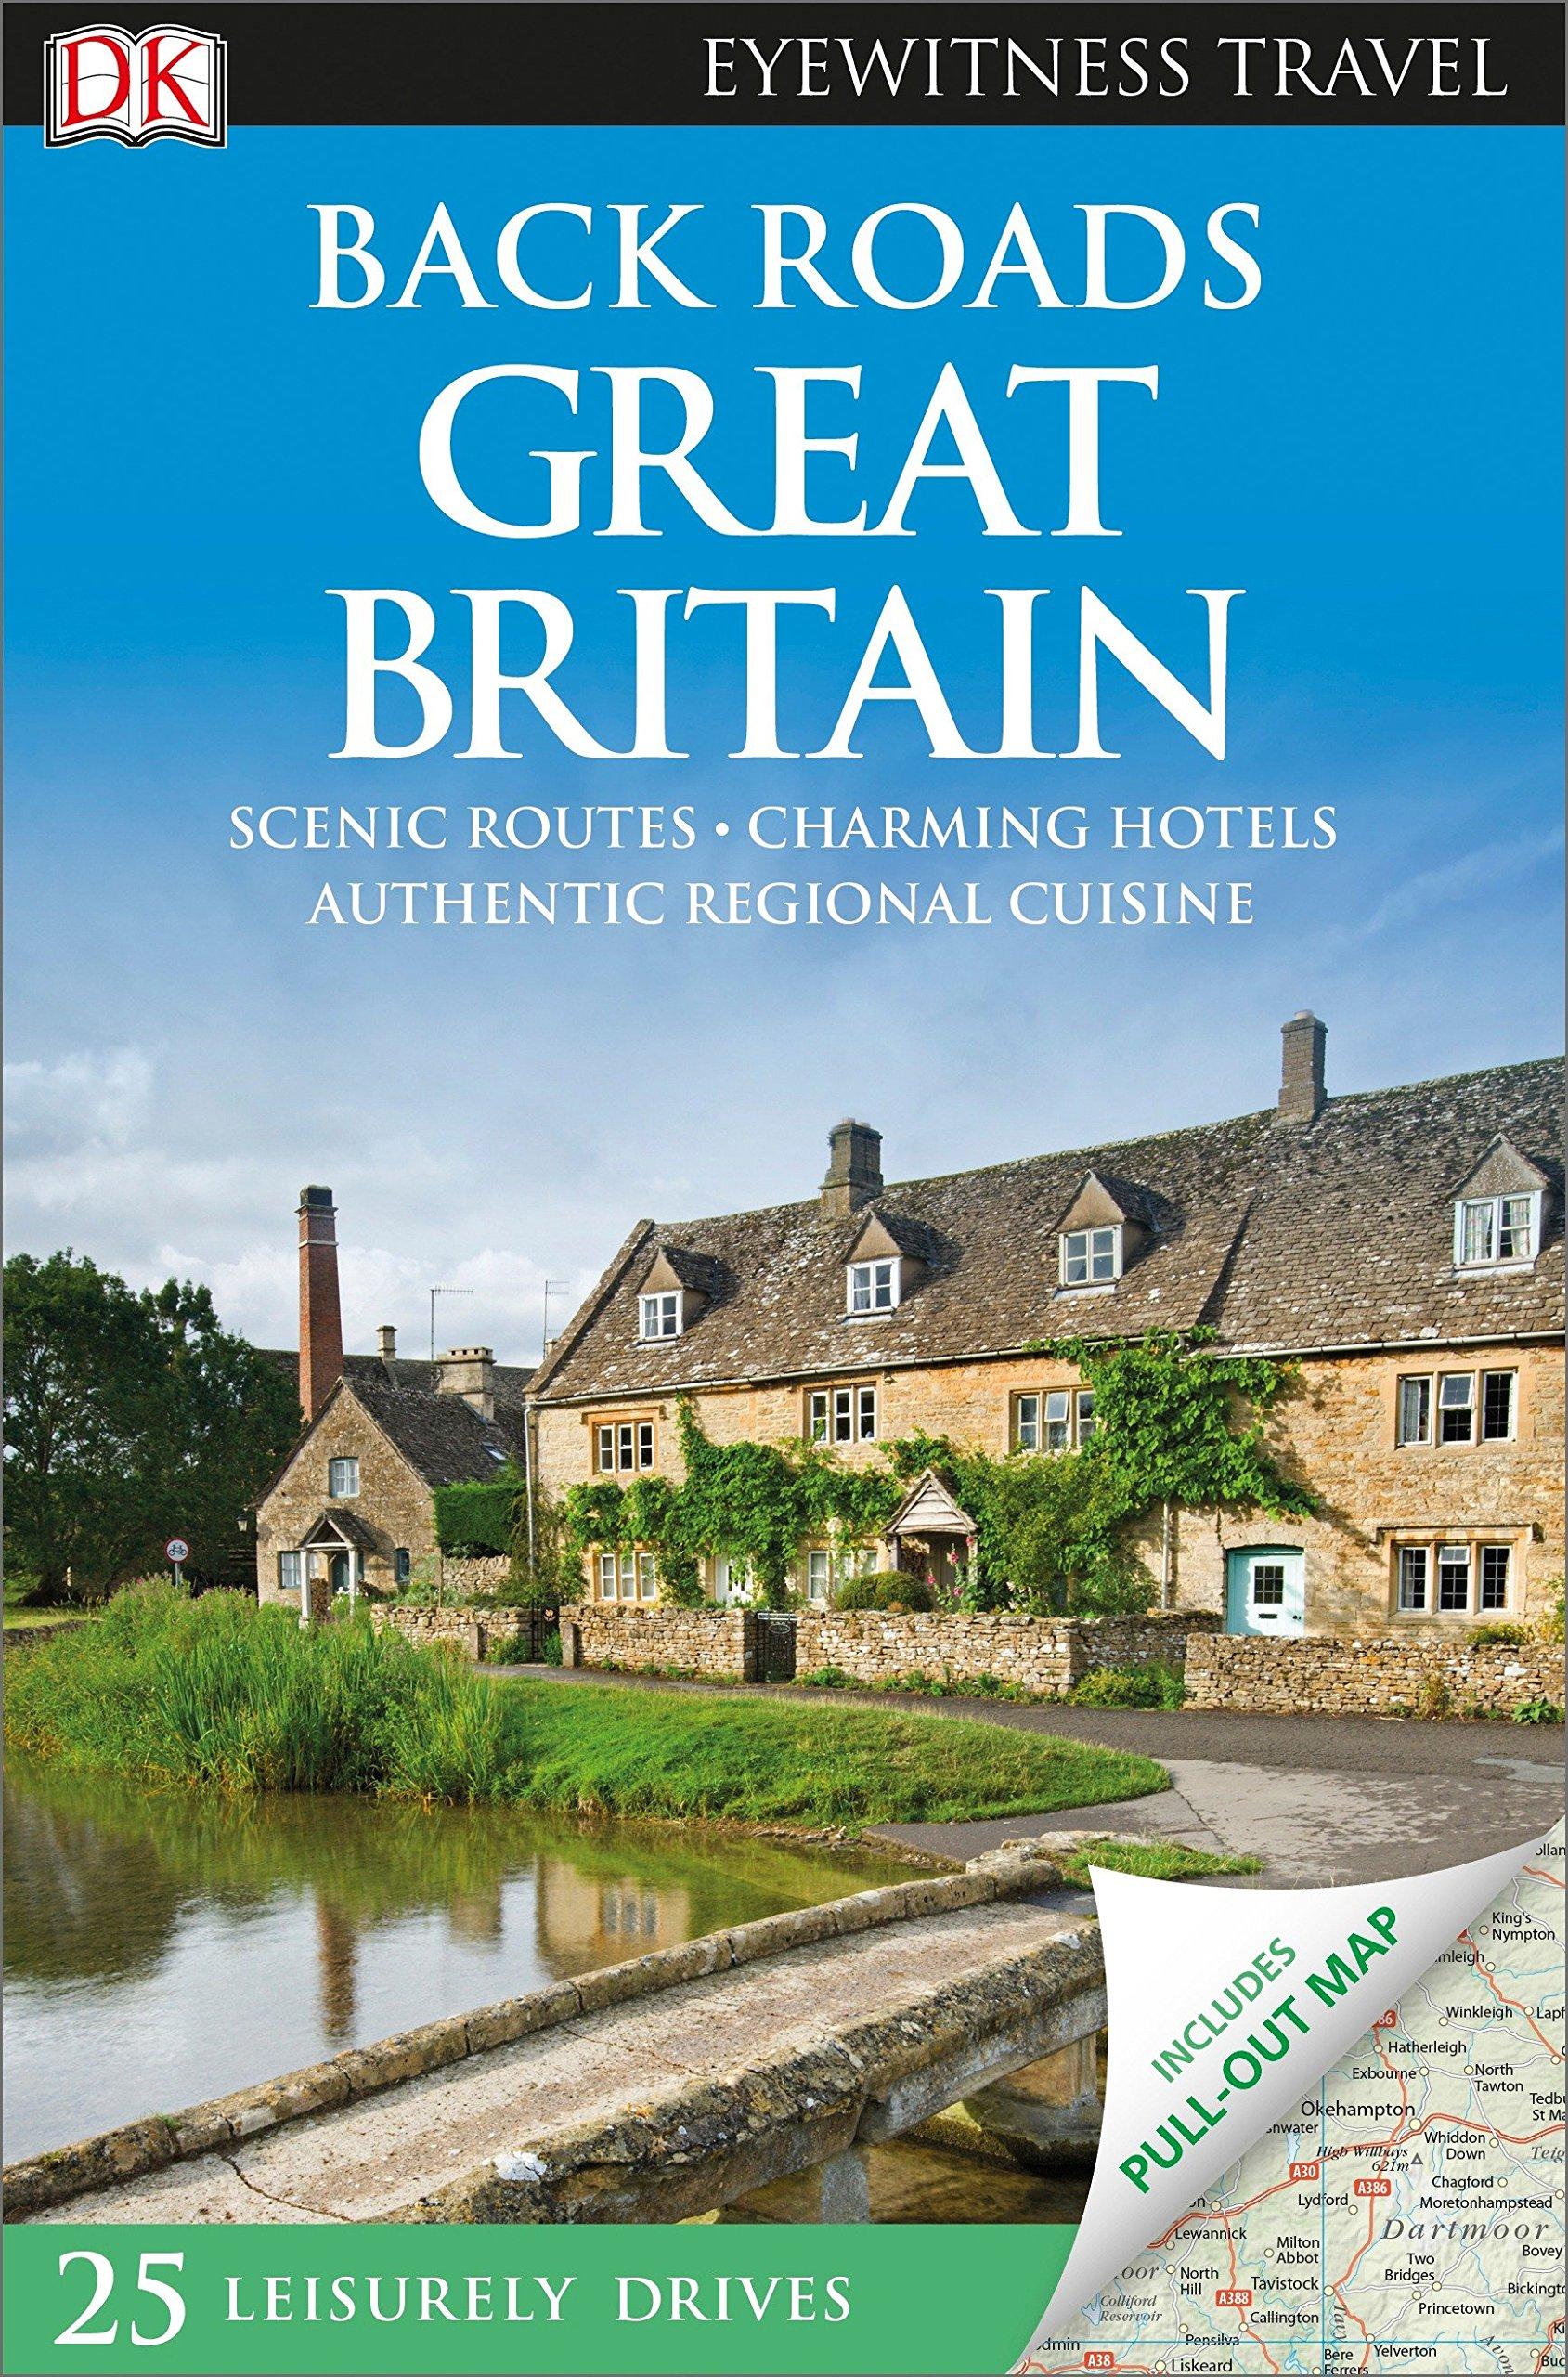 Roads Great Britain Eyewitness Travel